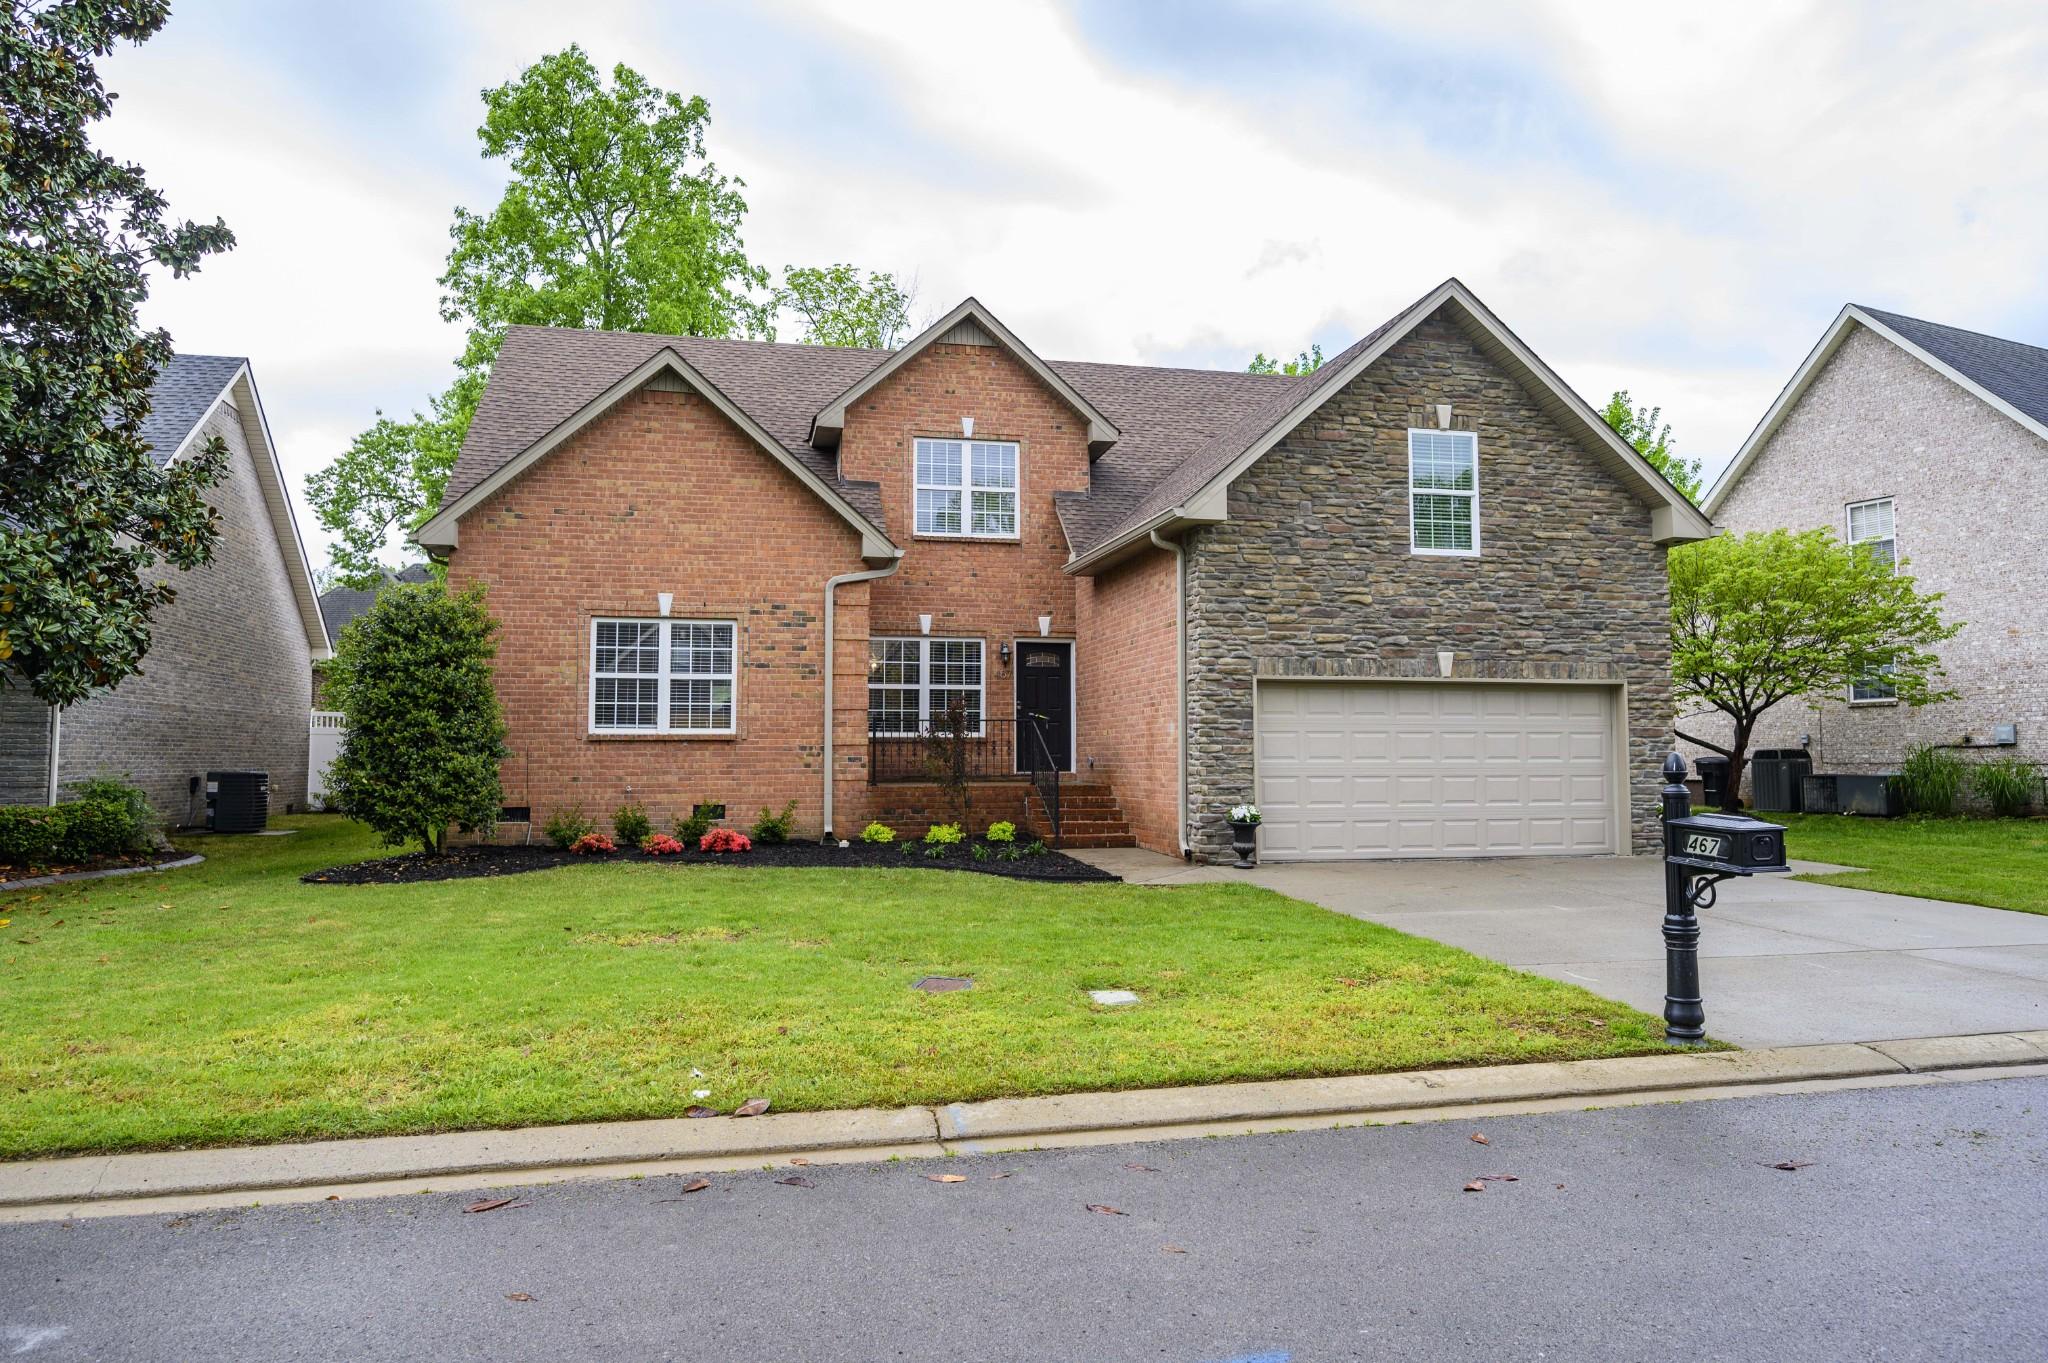 467 Bethany Cir Property Photo - Murfreesboro, TN real estate listing